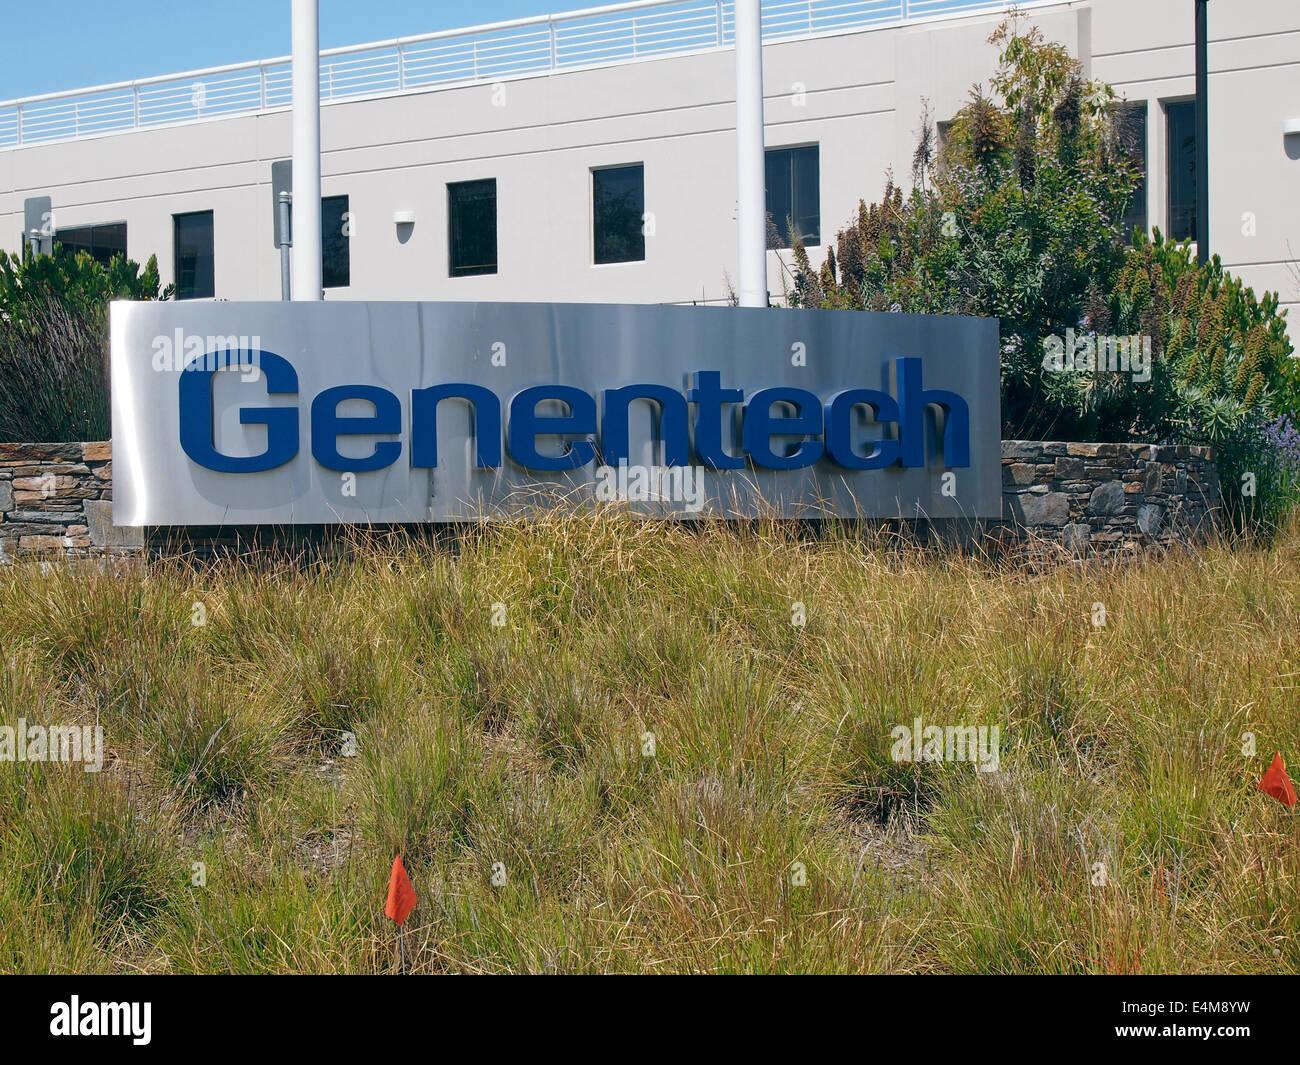 Genentech corporate headquarters, South San Francisco, California - Stock Image